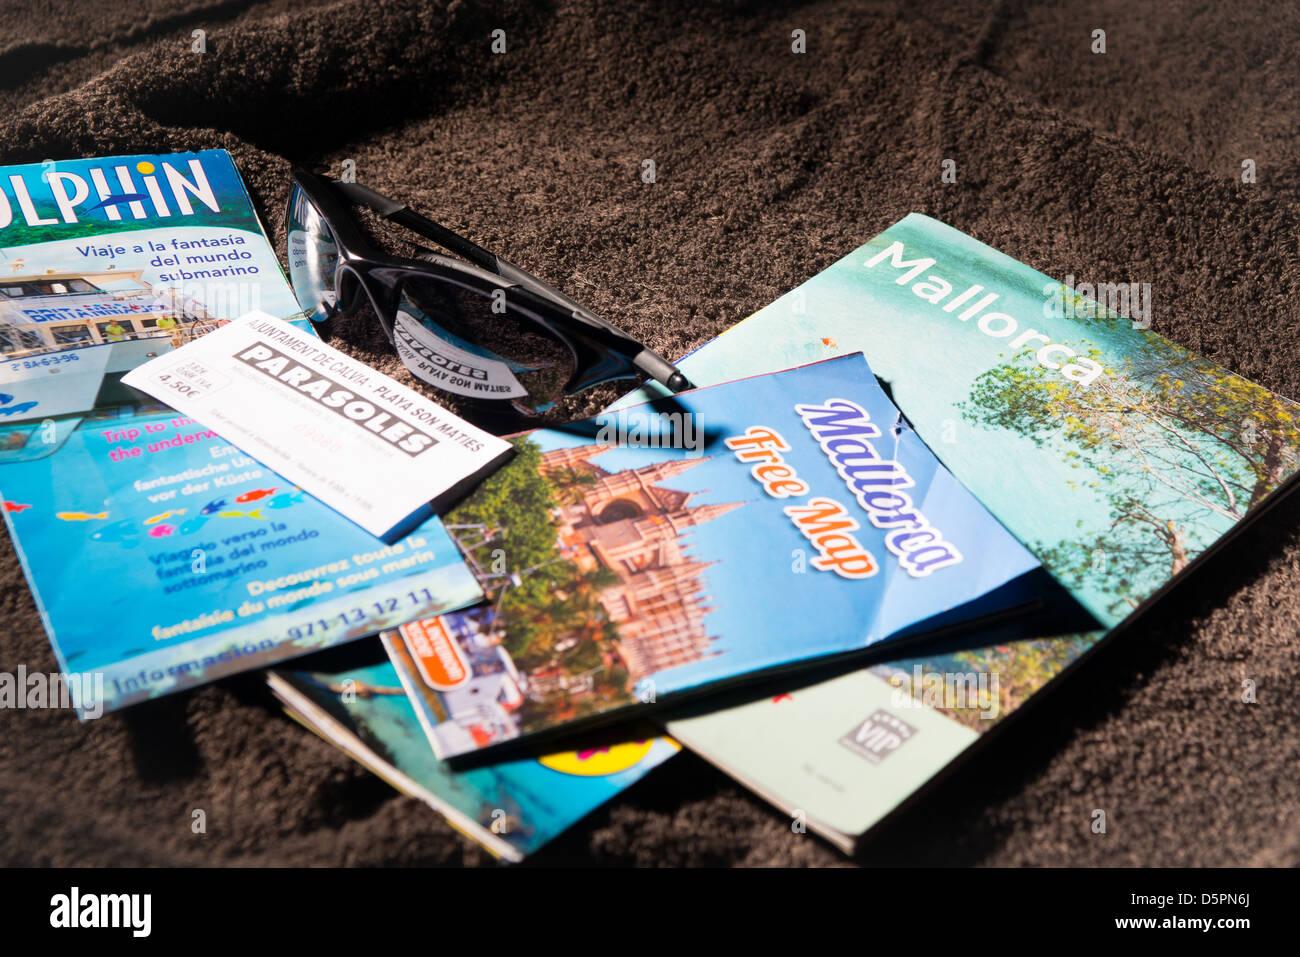 Mallorca holliday brochures on towel - Stock Image